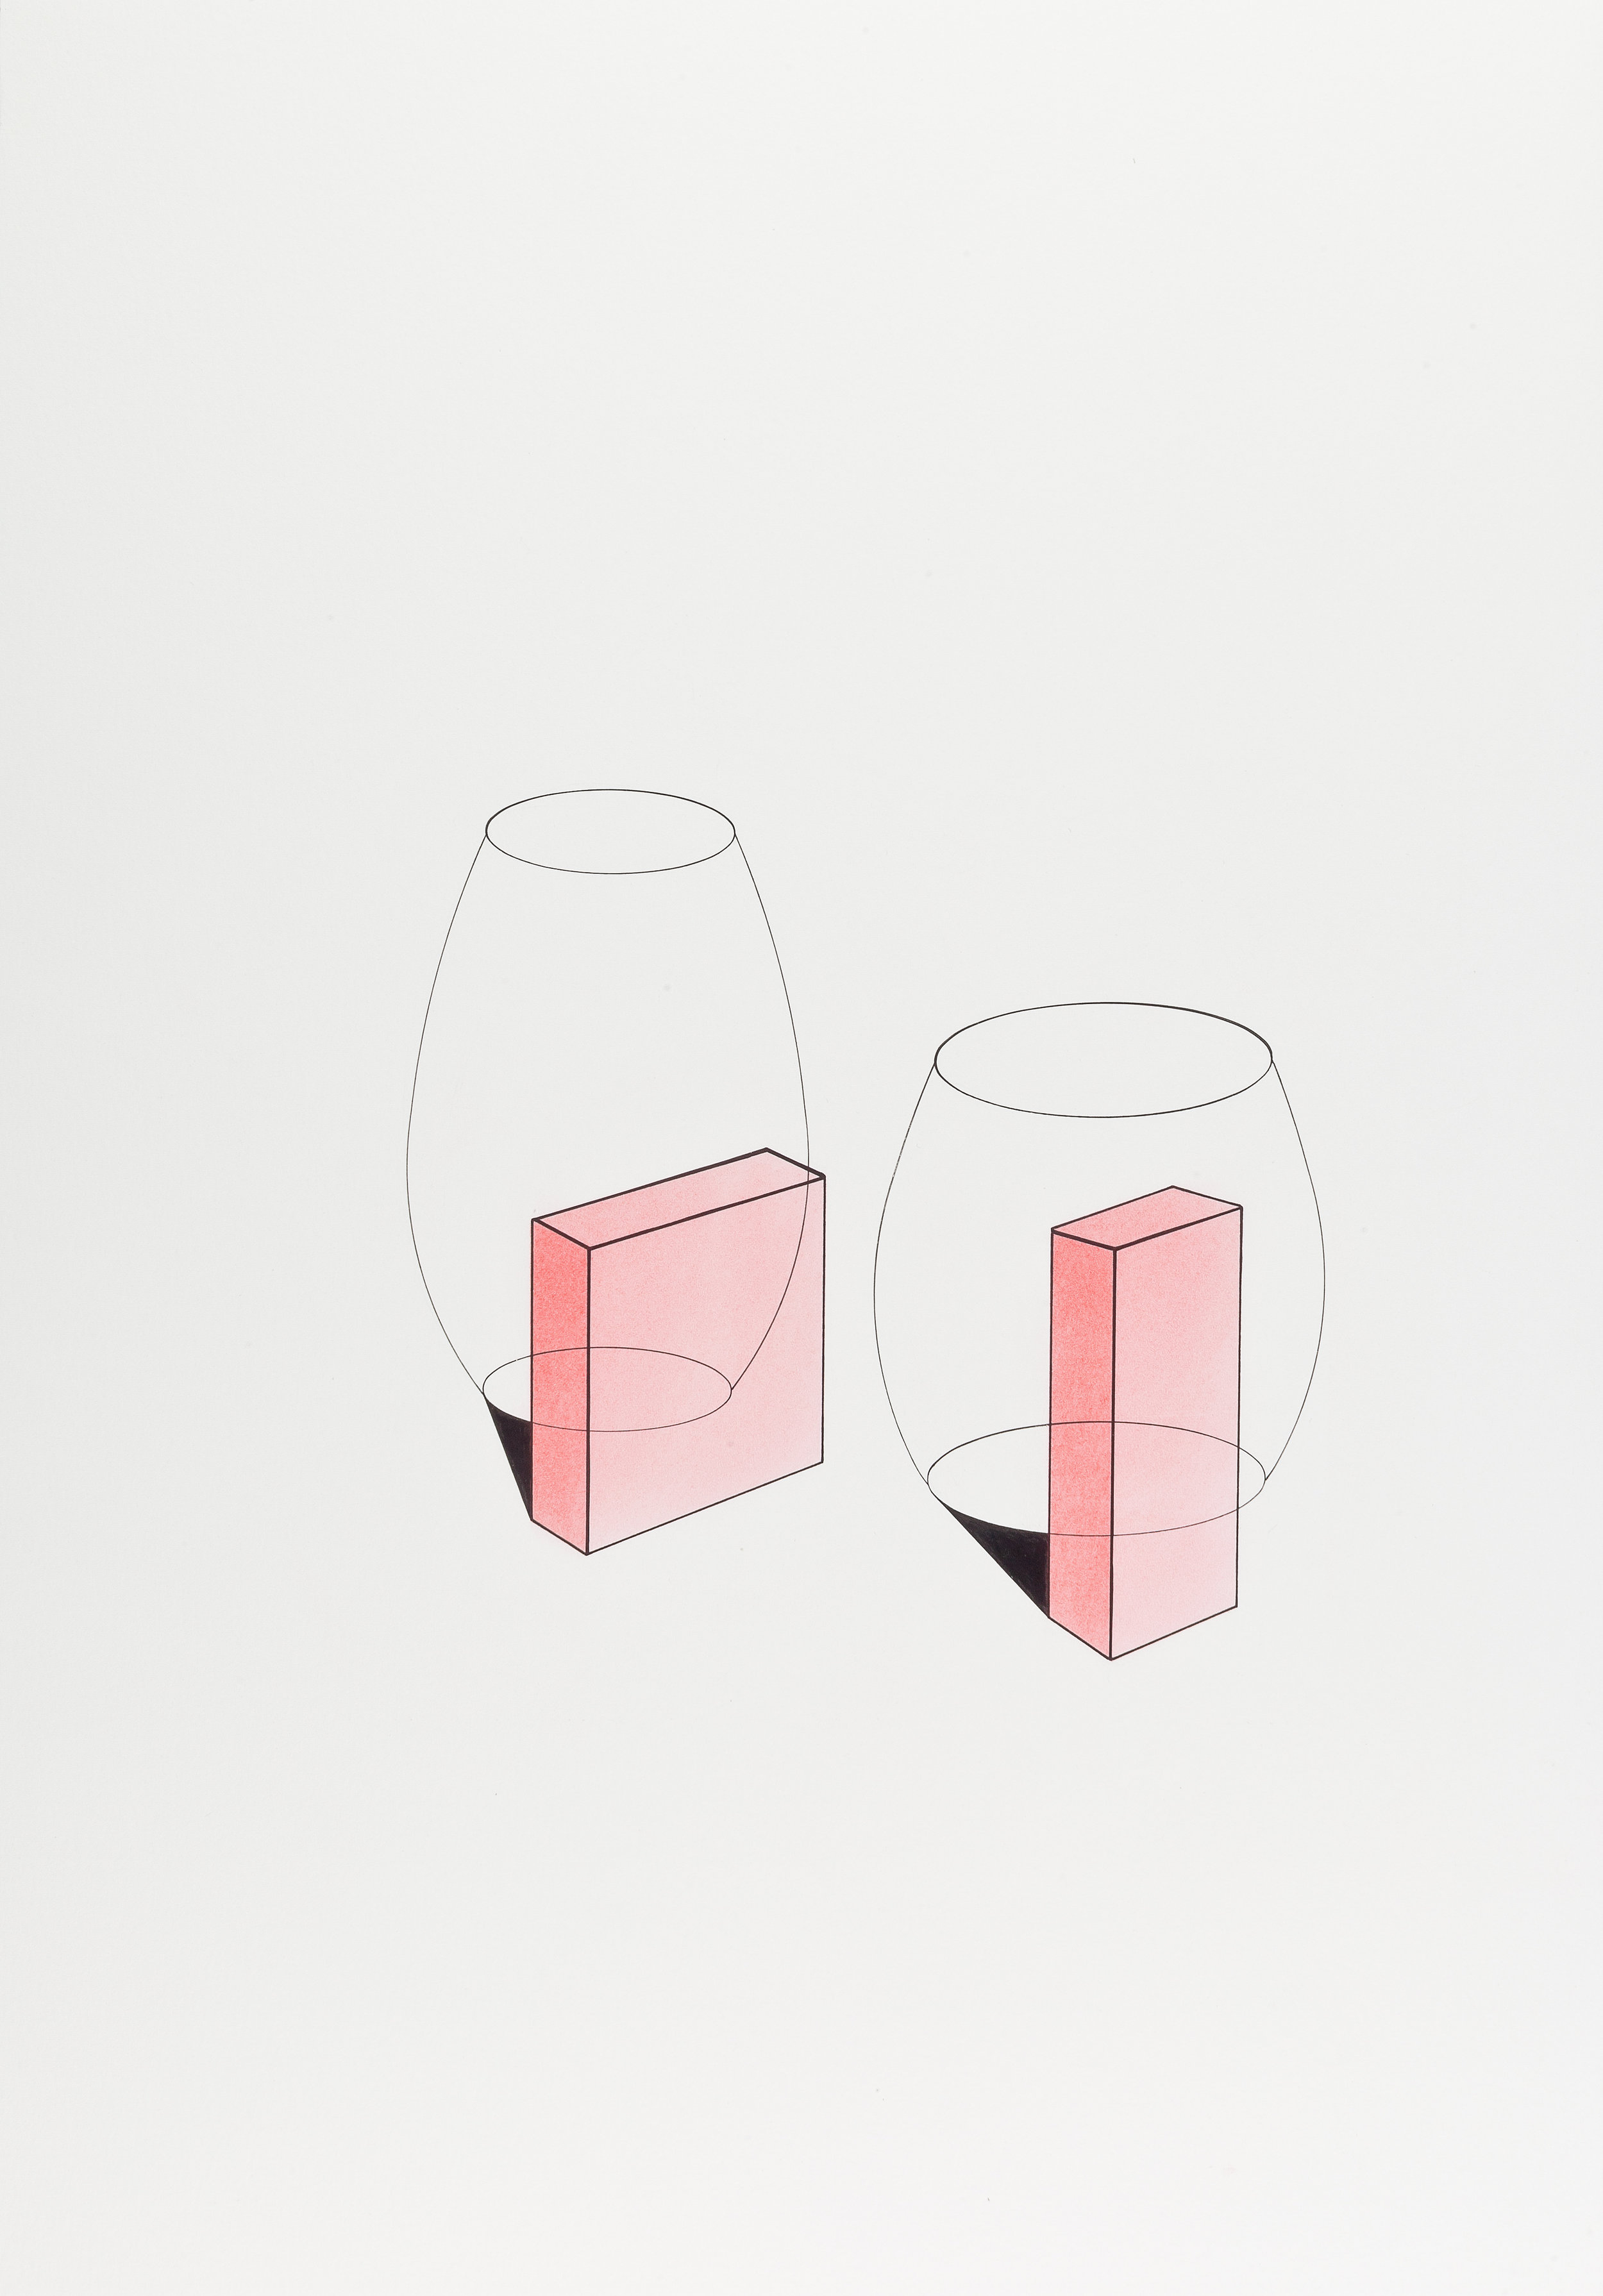 Galeria Raquel Arnaud. Waltercio Caldas, 2012 .Untitled.